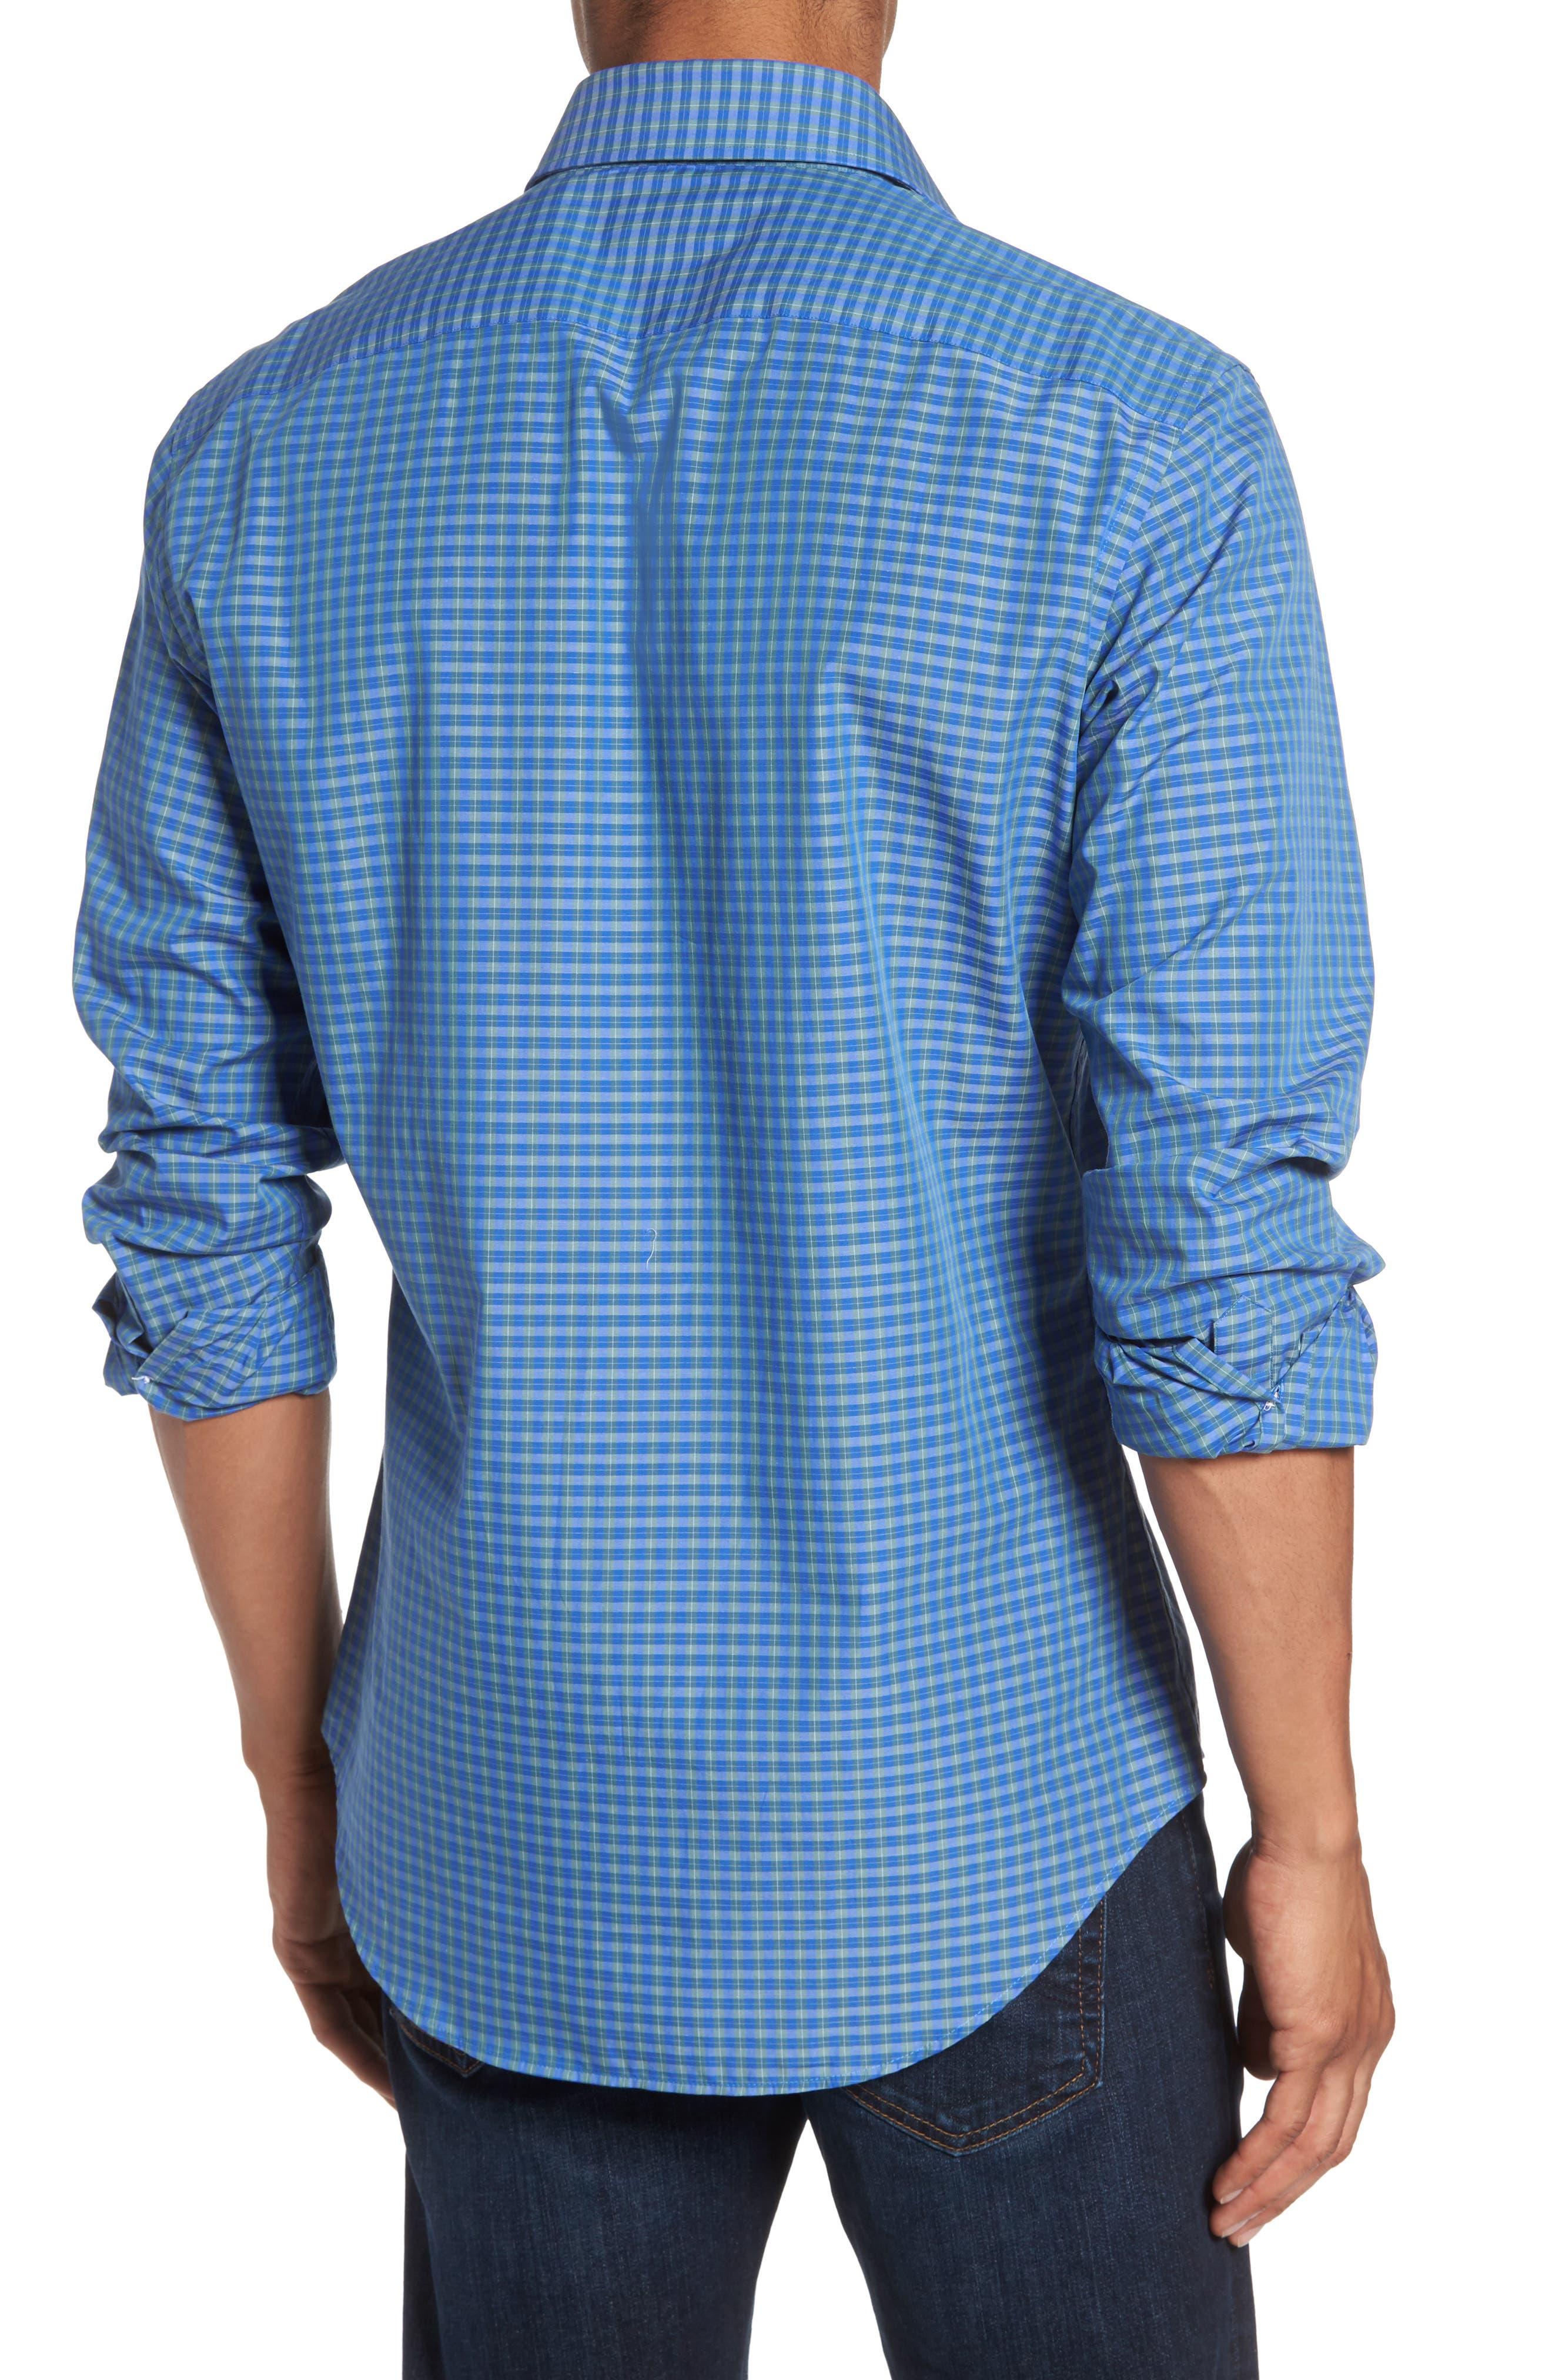 Alternate Image 2  - Ledbury Alden Slim Fit Plaid Sport Shirt